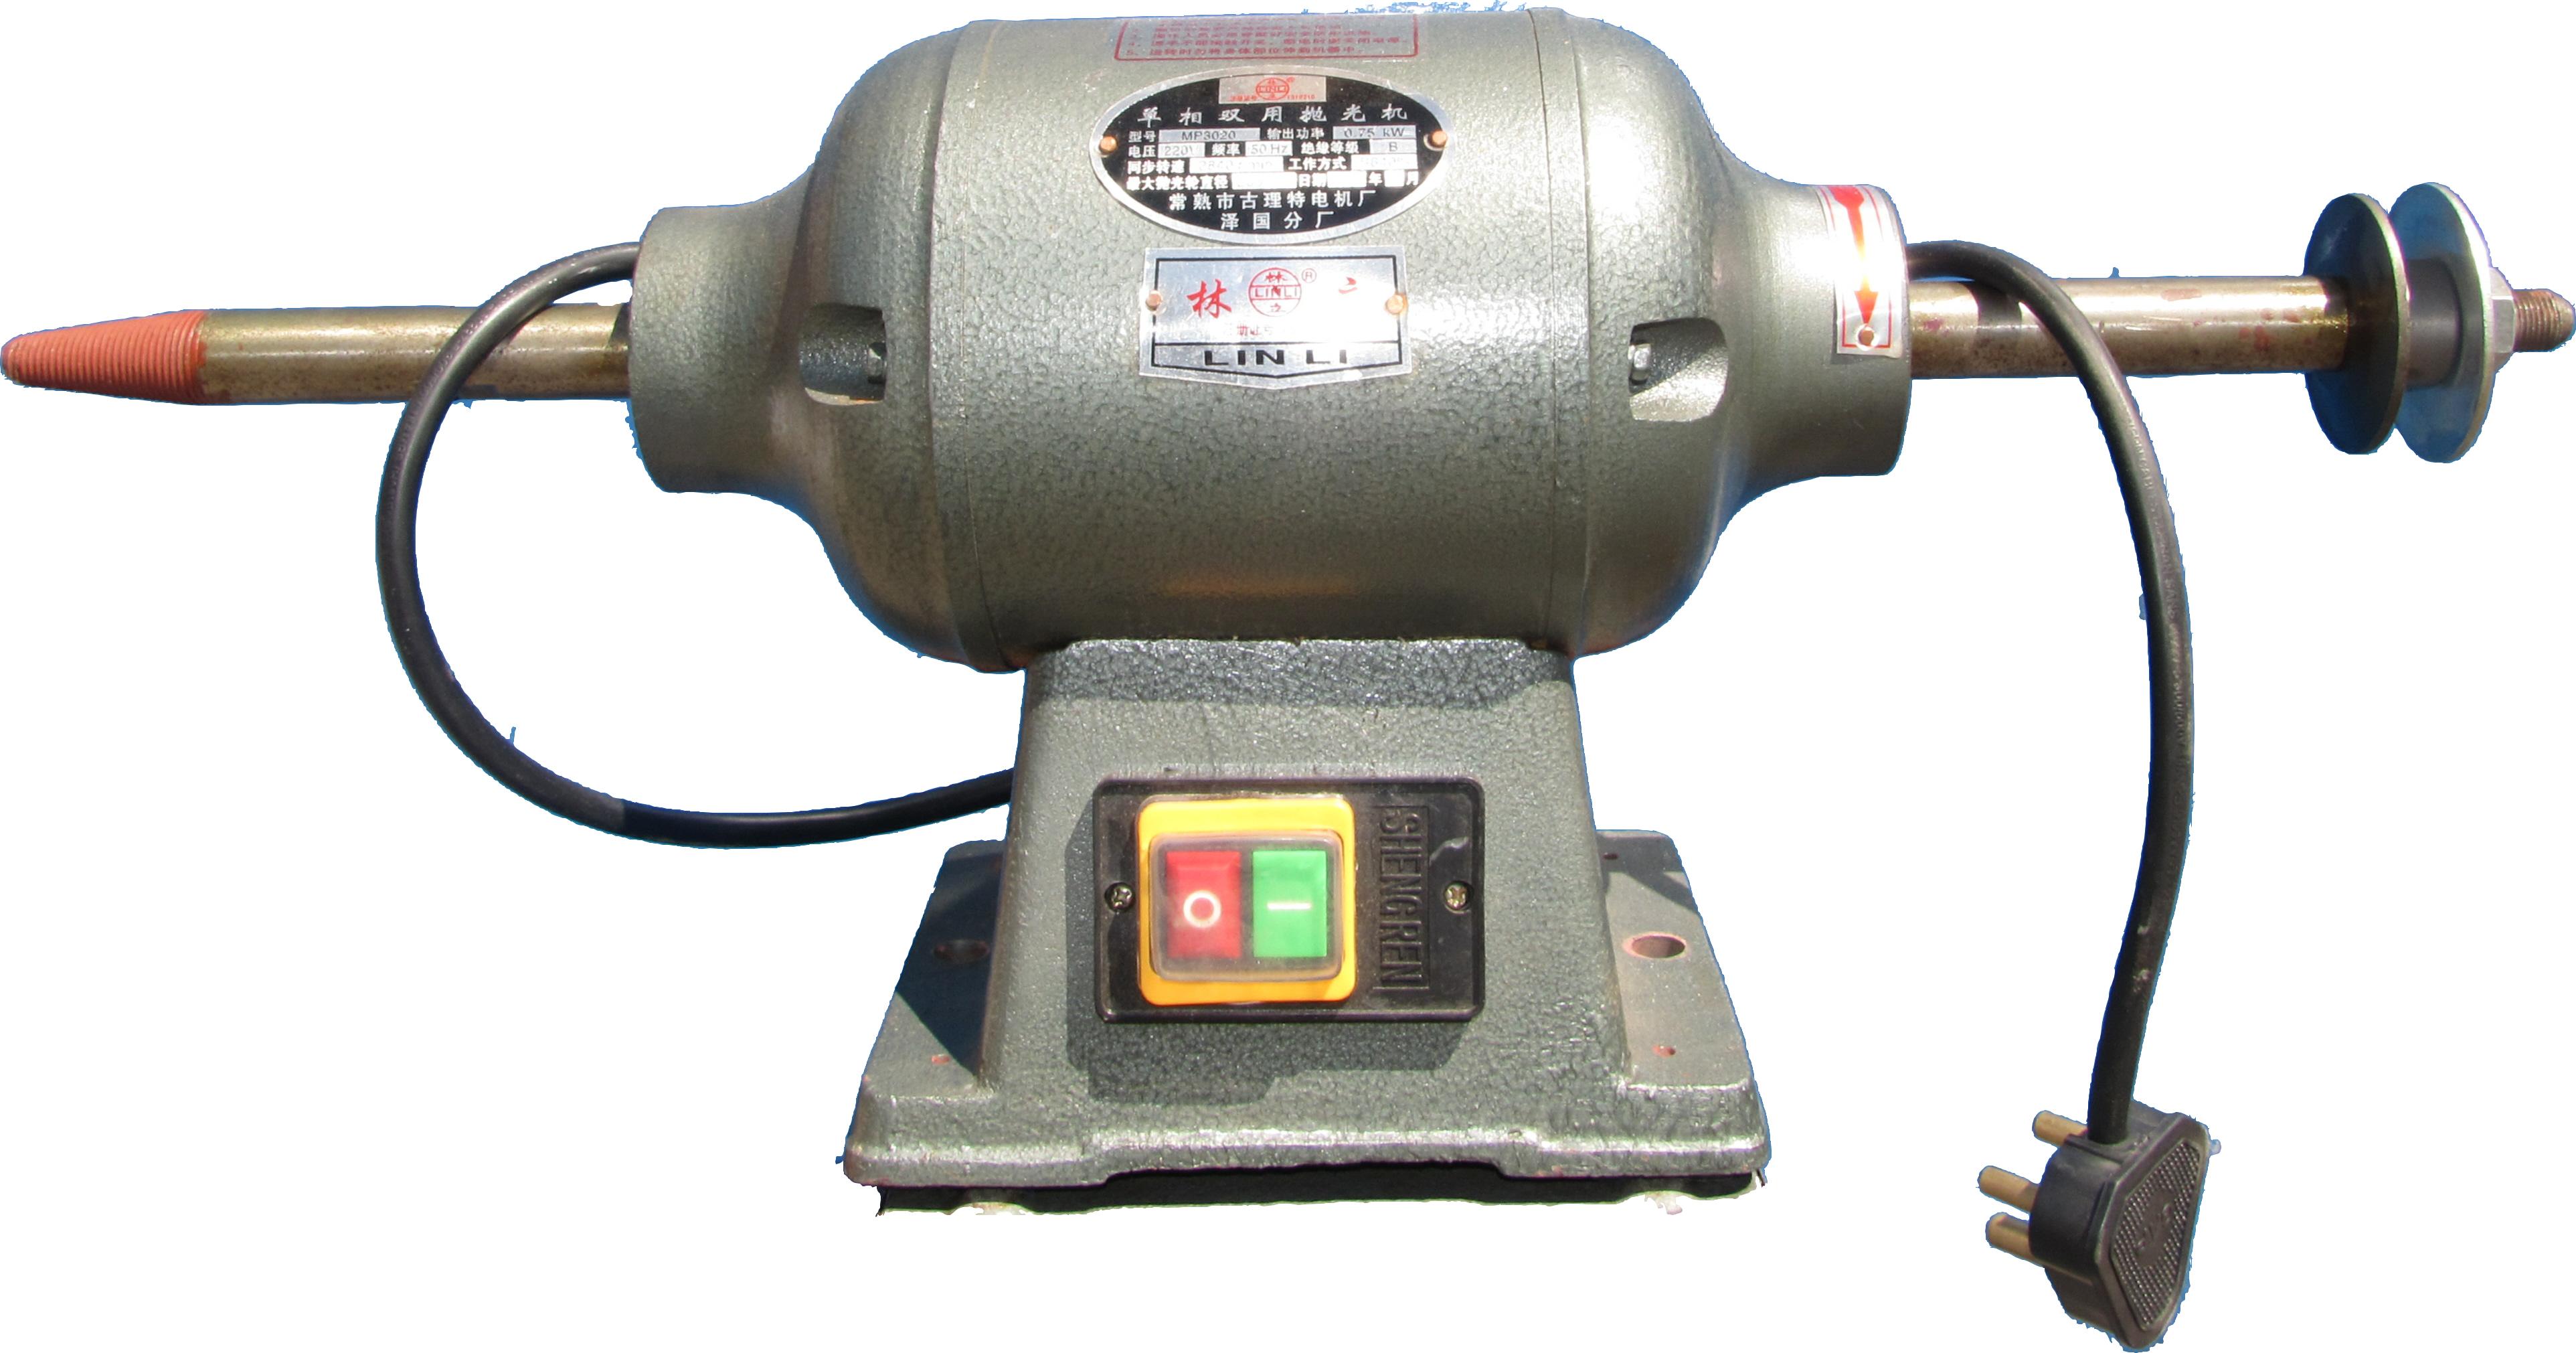 rebuff-075 polisher